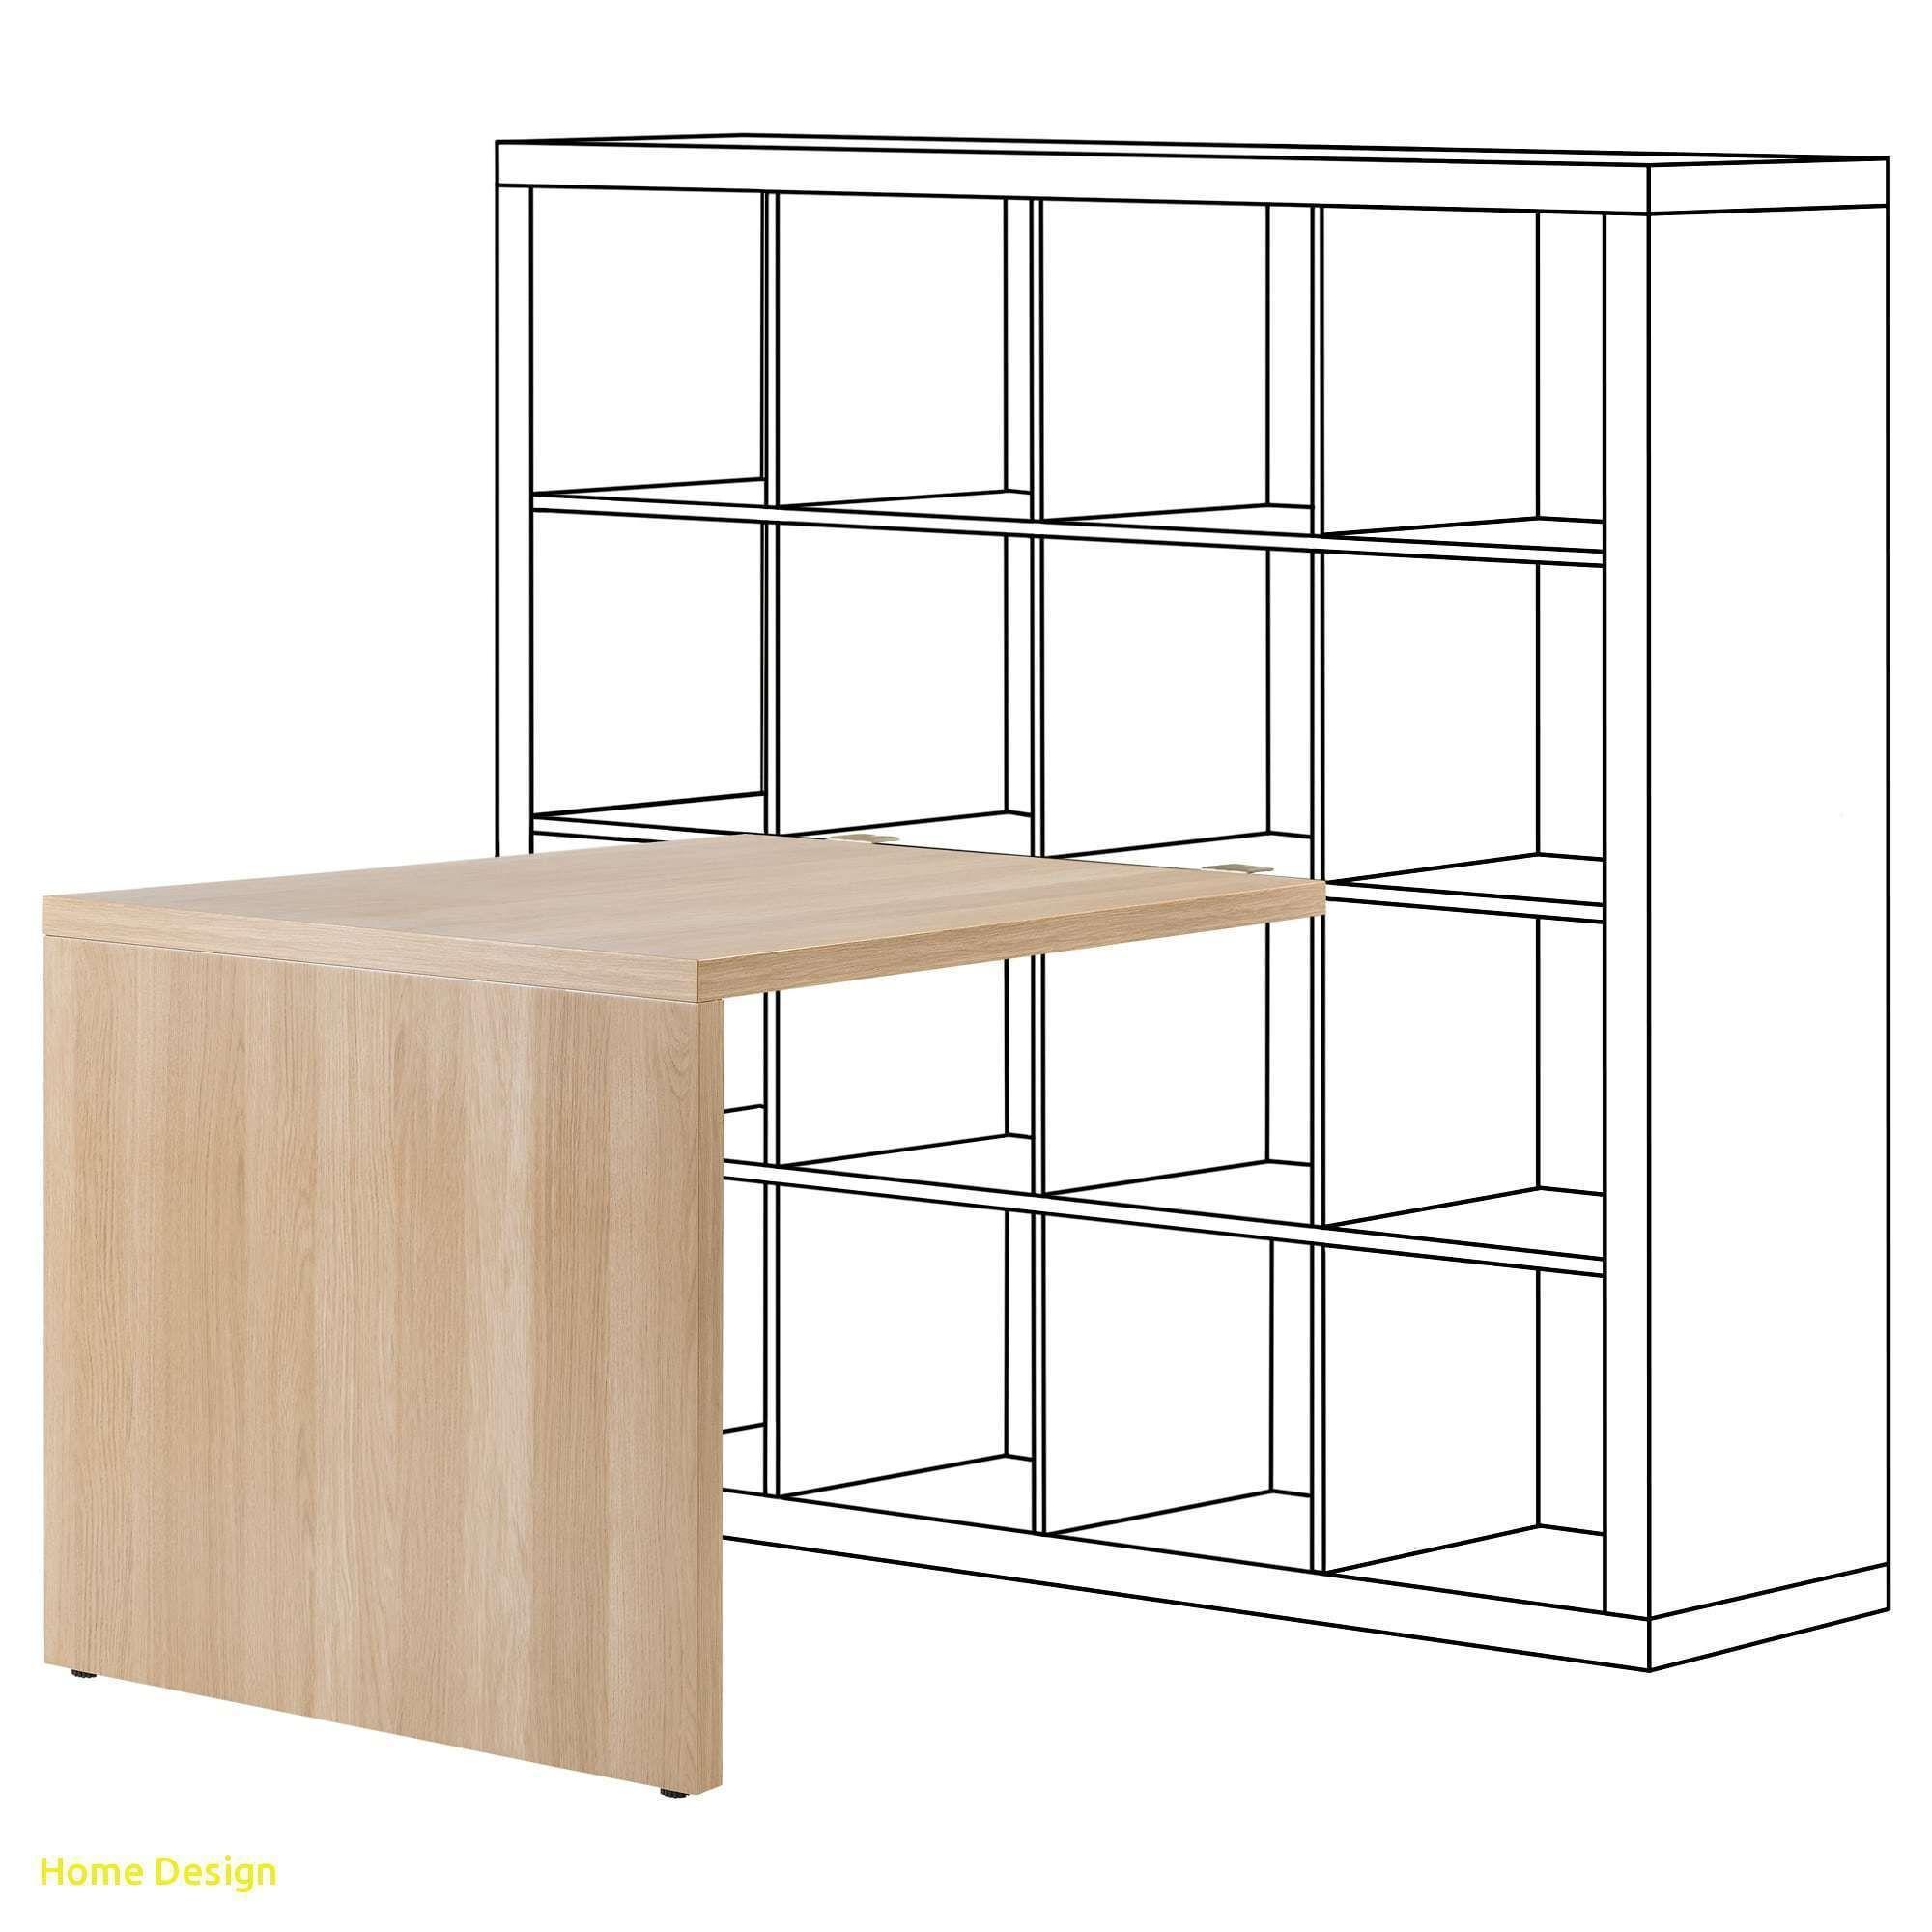 Best Of Kallax Assembly Instructions Pdf Homedesign Homedecor Homediy Https Klikhomedesign Com Kallax Asse Kallax Ikea Kallax Desk Kallax Shelving Unit